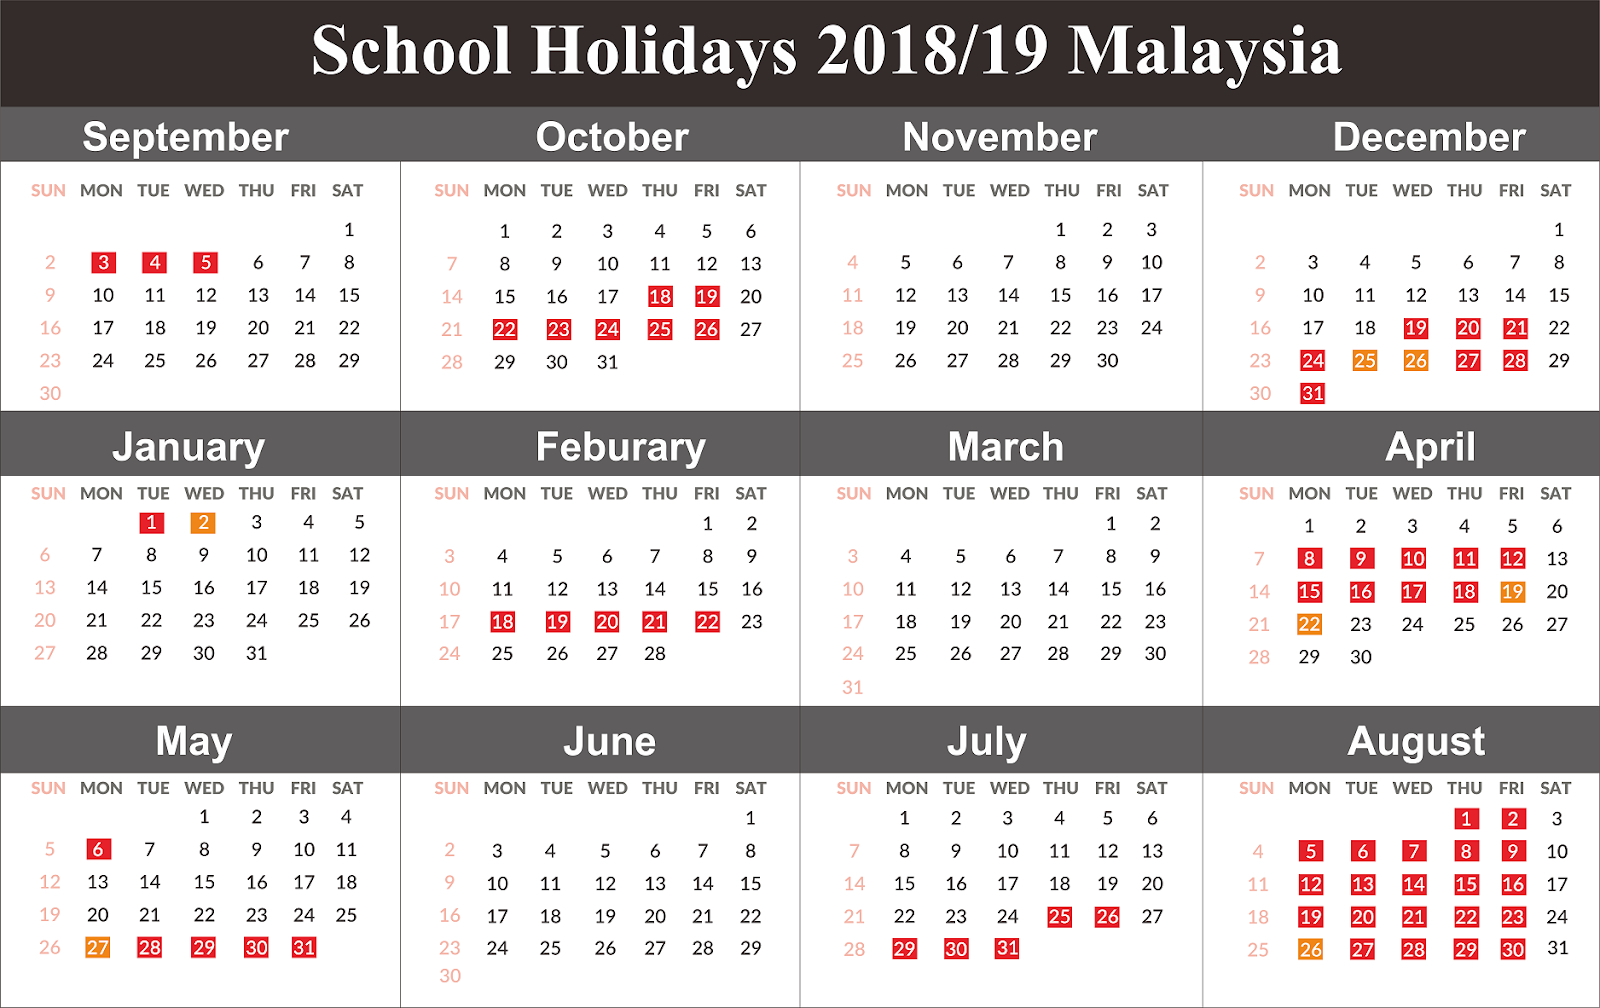 Free Download School Holiday 2019 Malaysia {Template} Calendar 2019 Malaysia